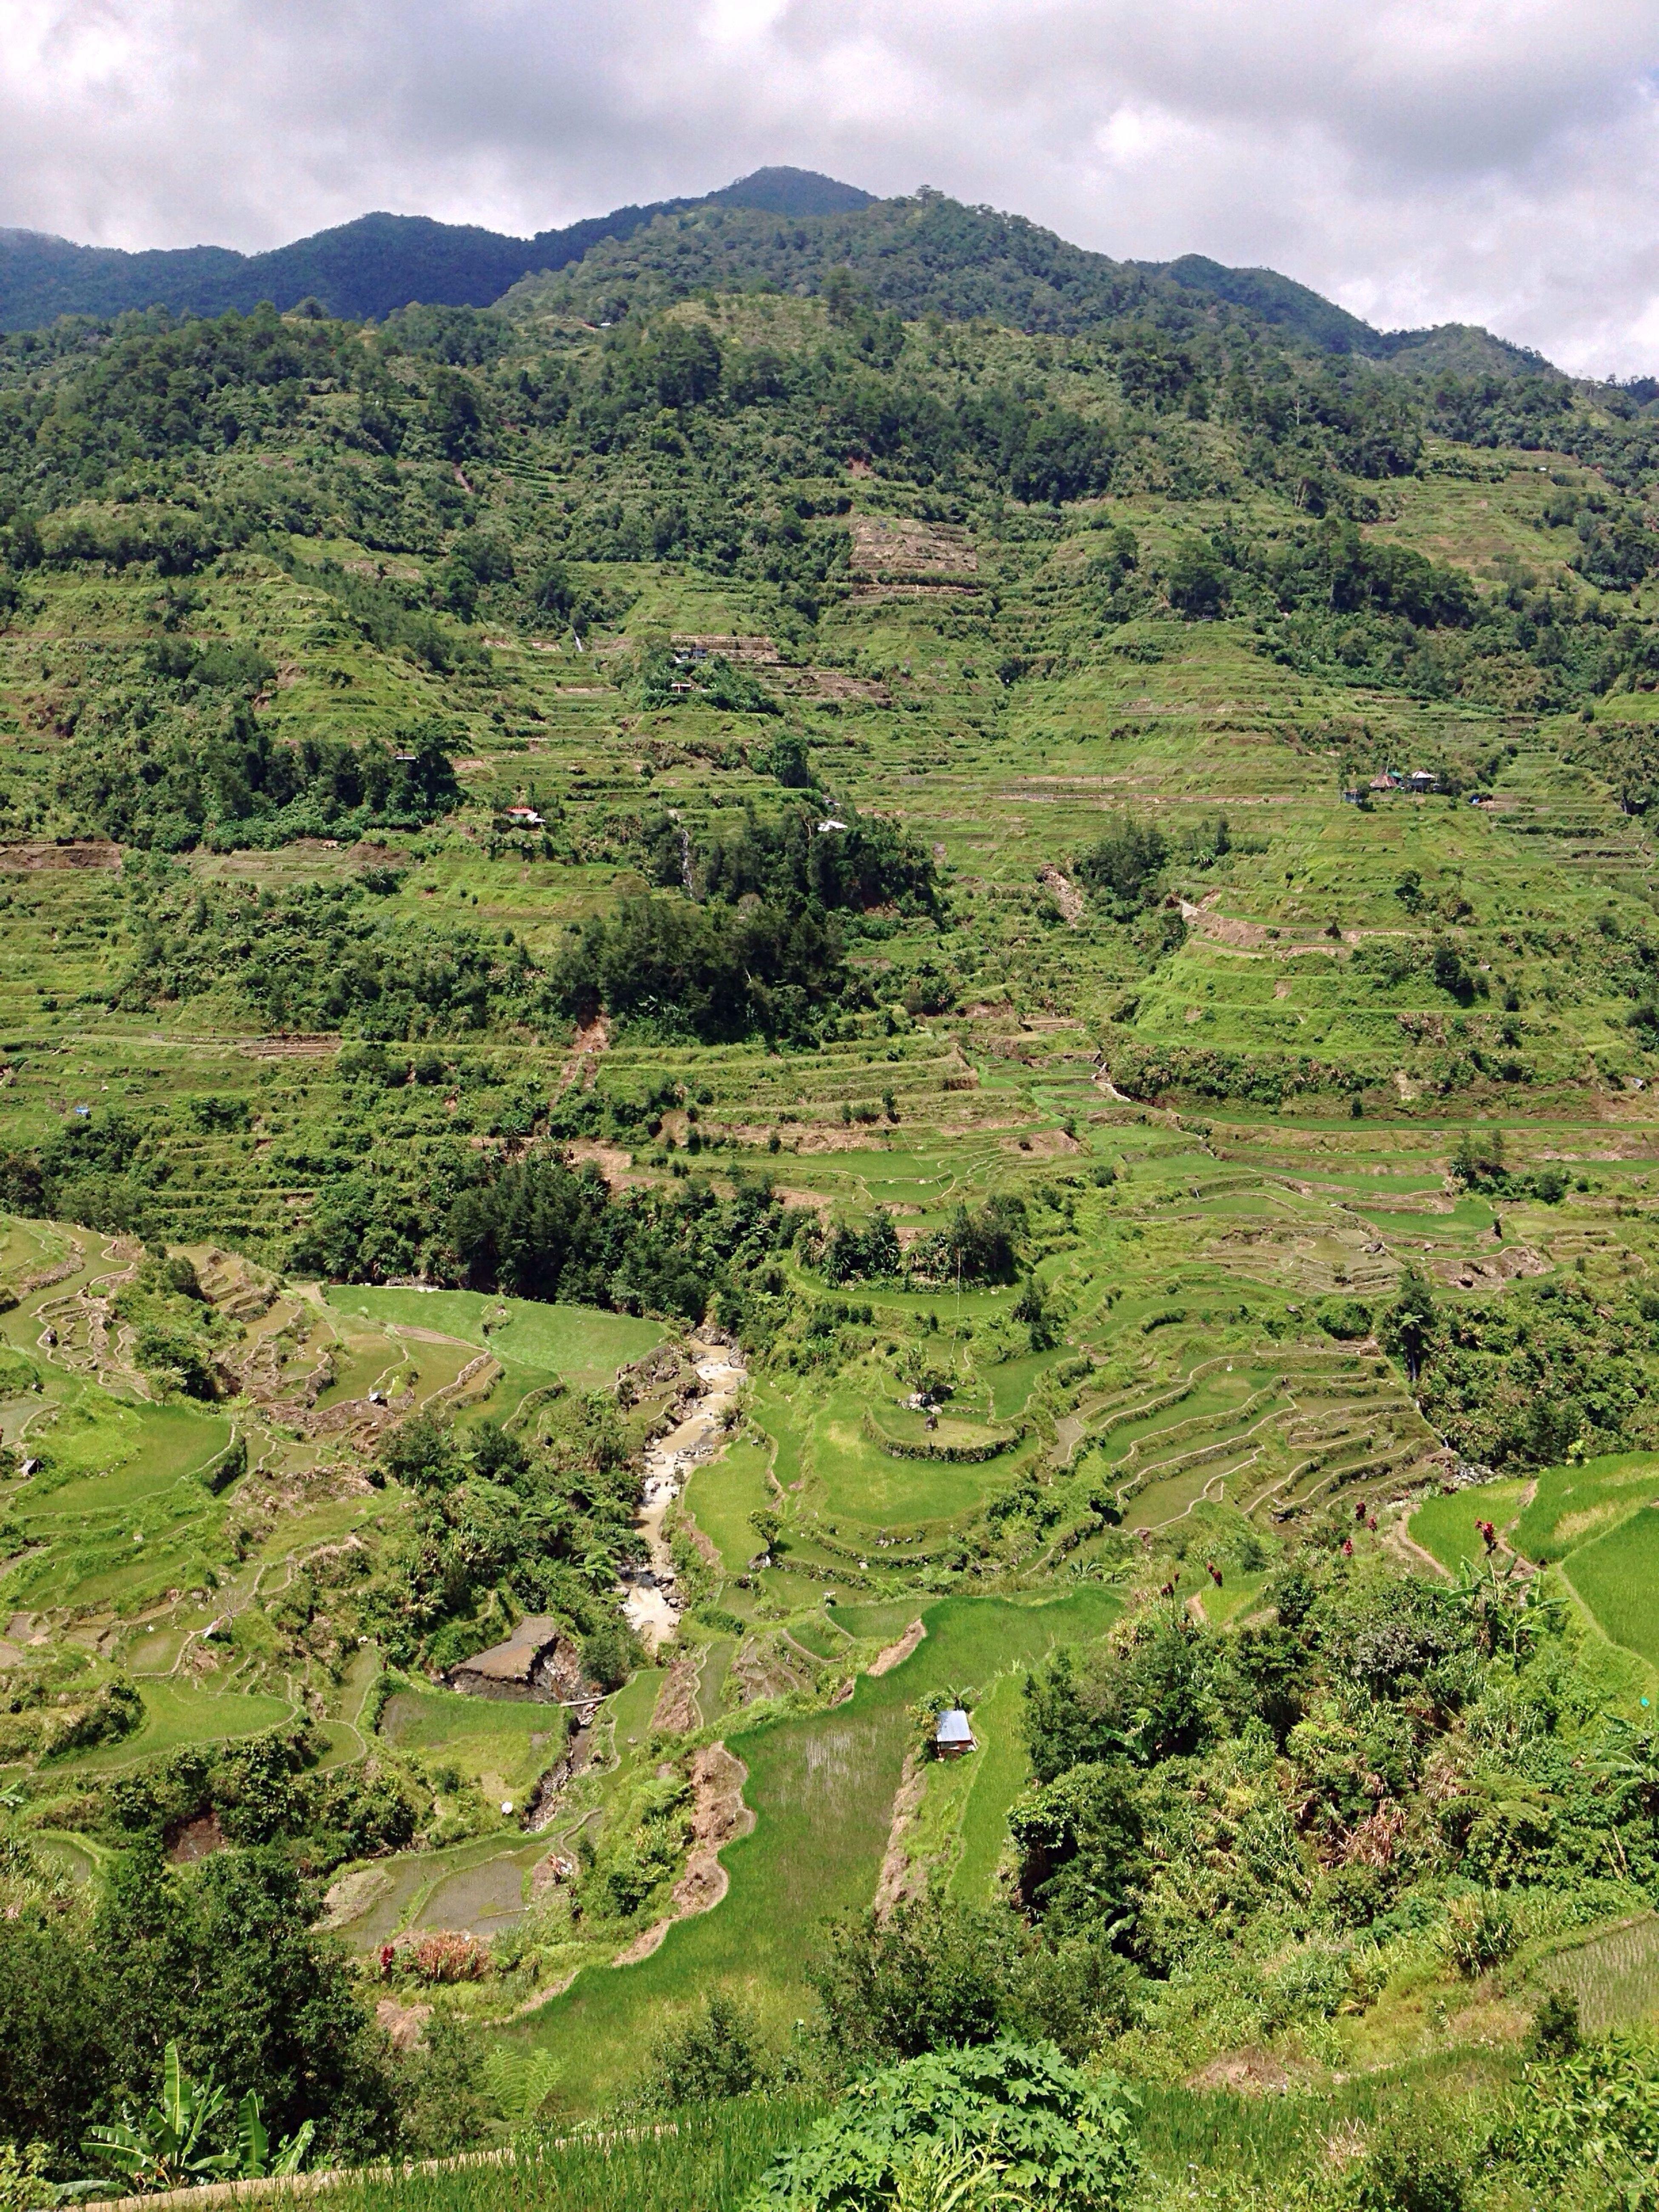 Scenery Shots Banue Rice Terraces Rice Terraces Eyeem Philippines Nature Philippines